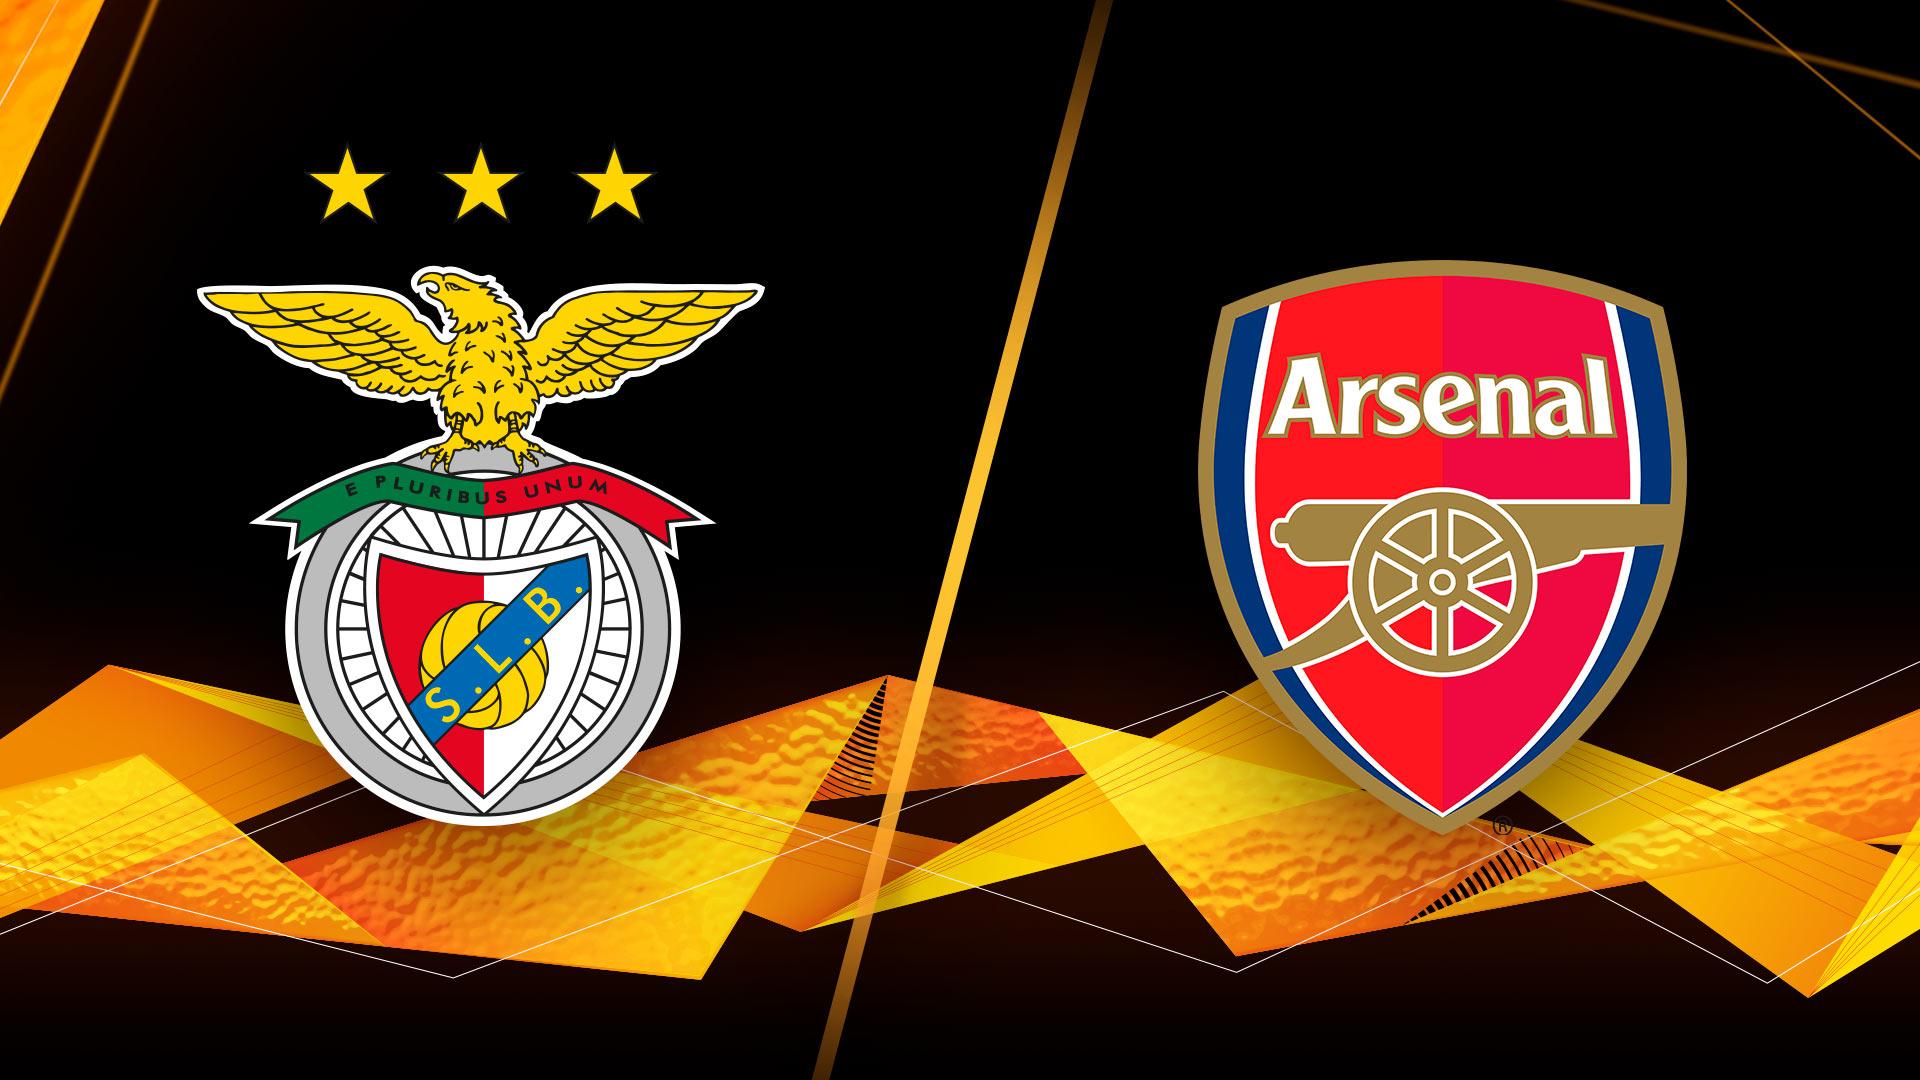 Benfica vs Arsenal Full Match – Europa League 2020/21